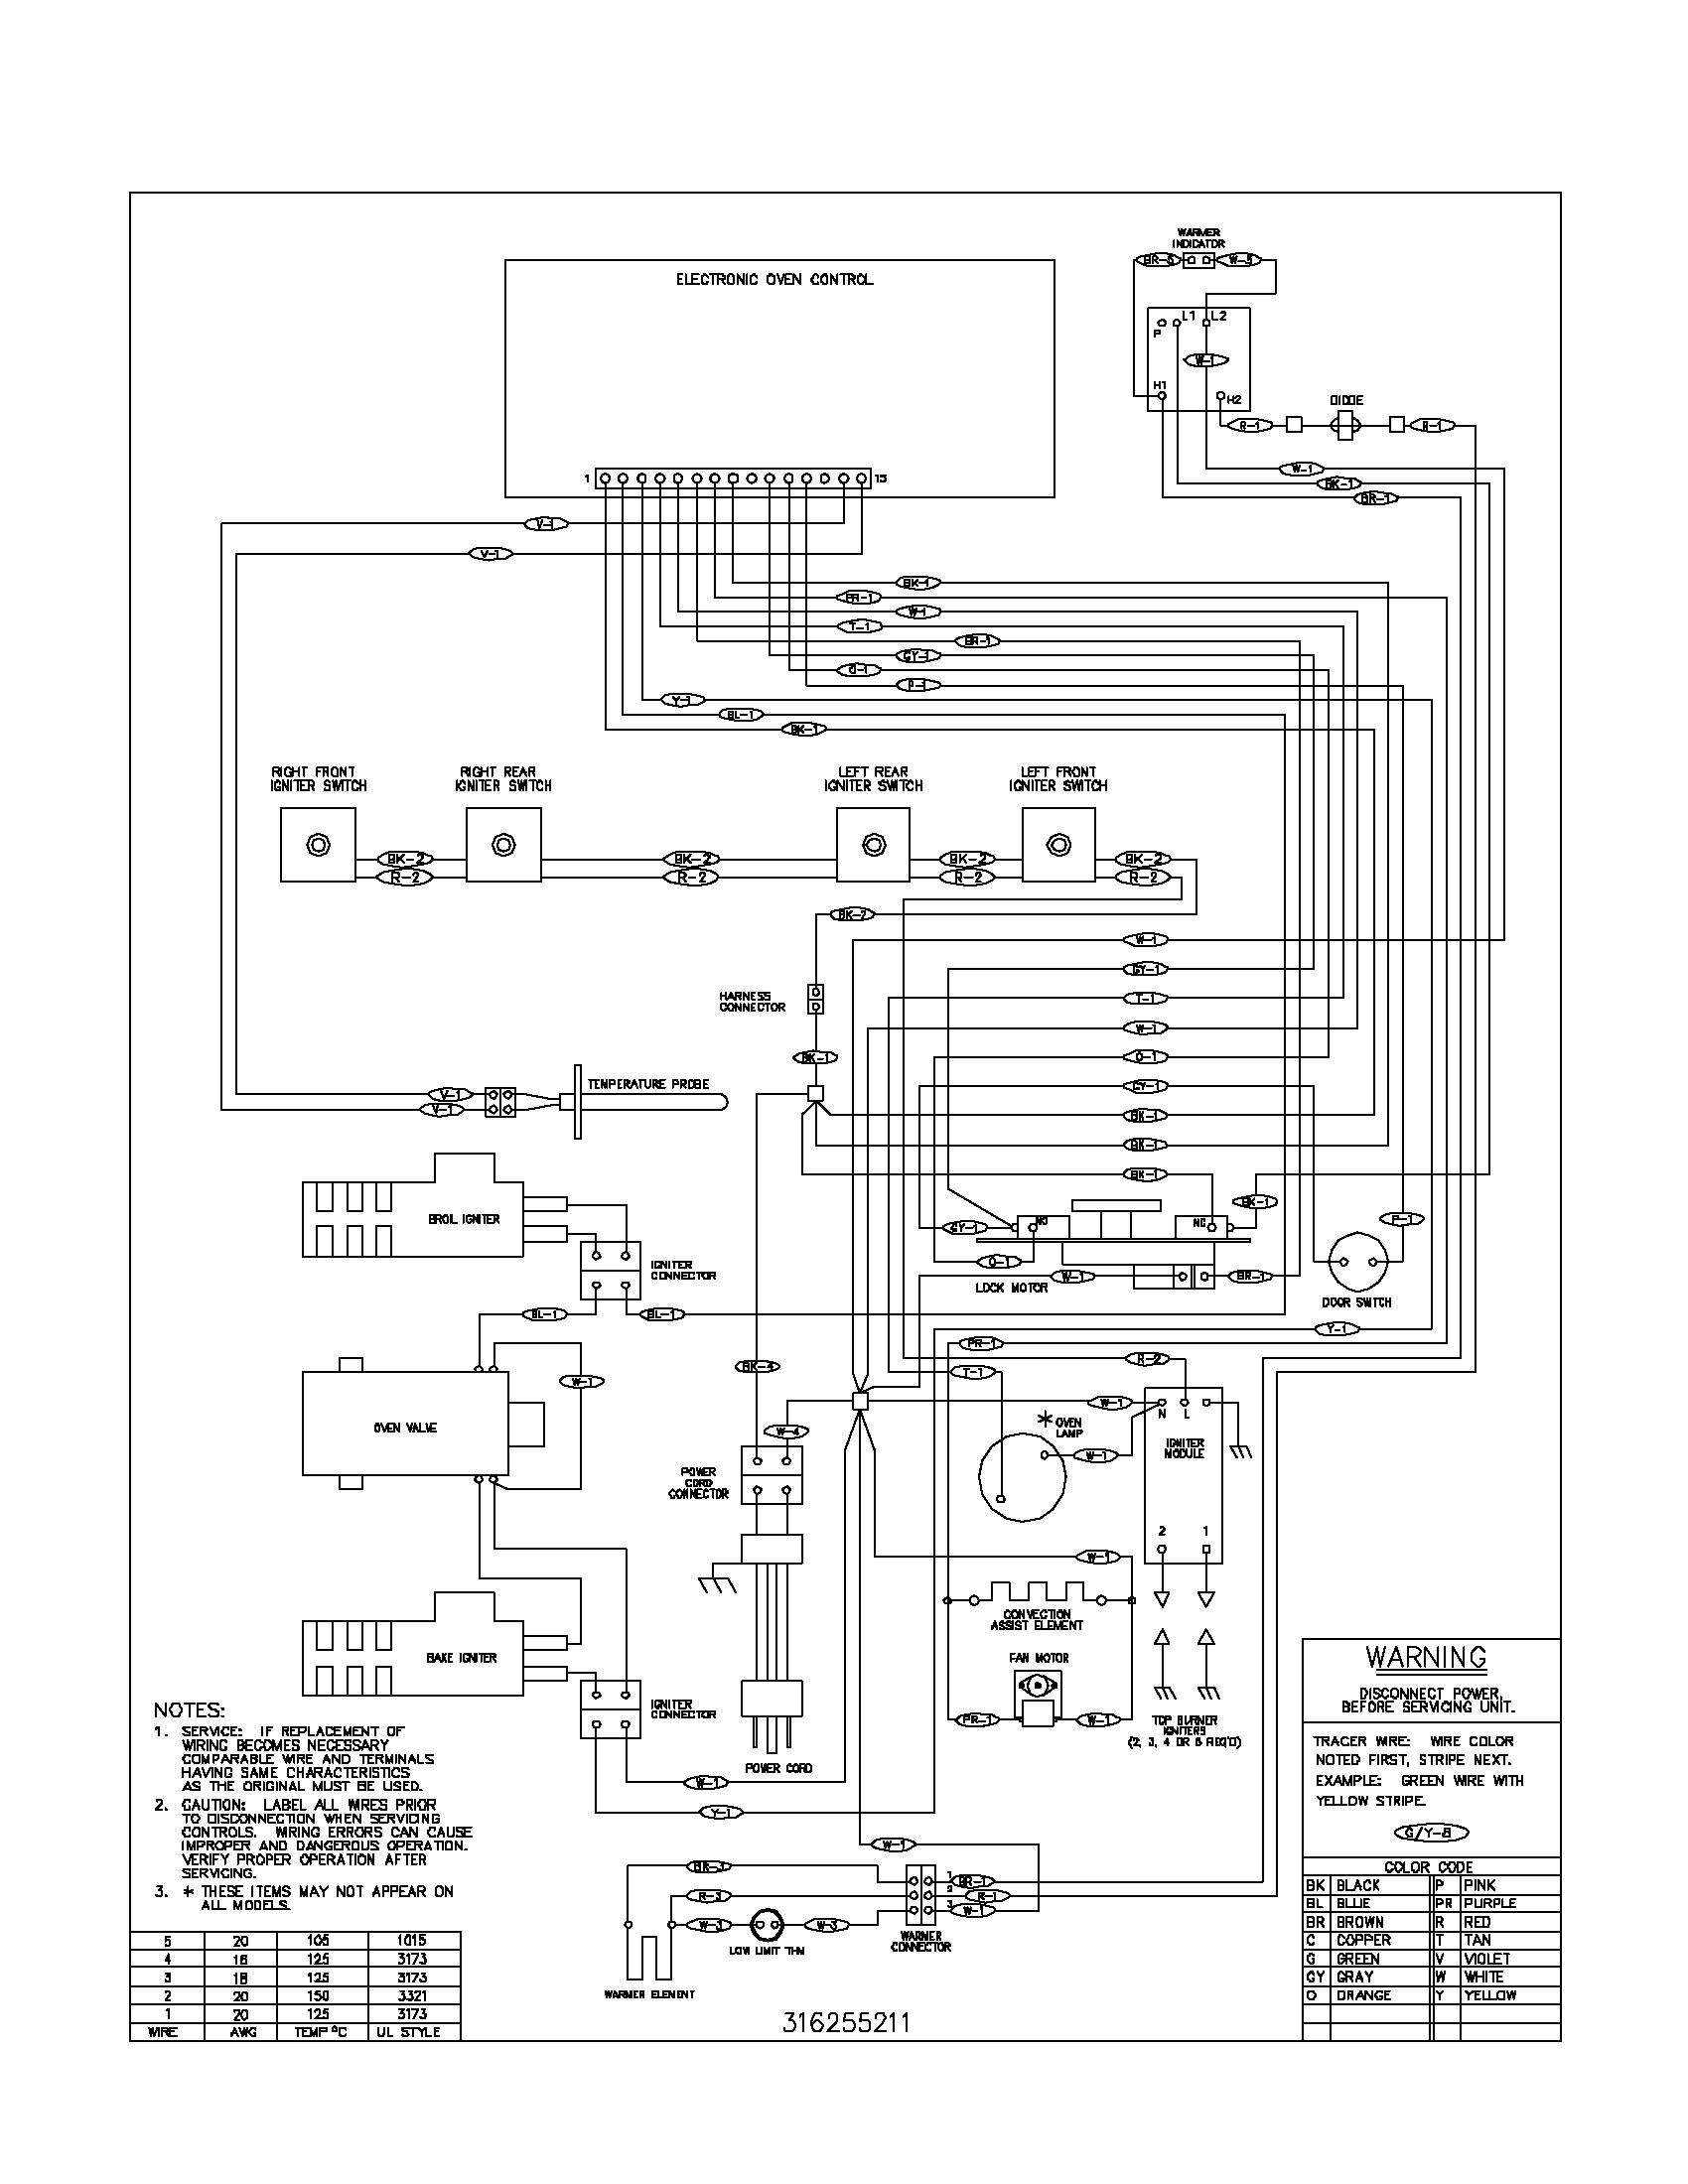 Samsung Washer Wiring Diagram Get Free